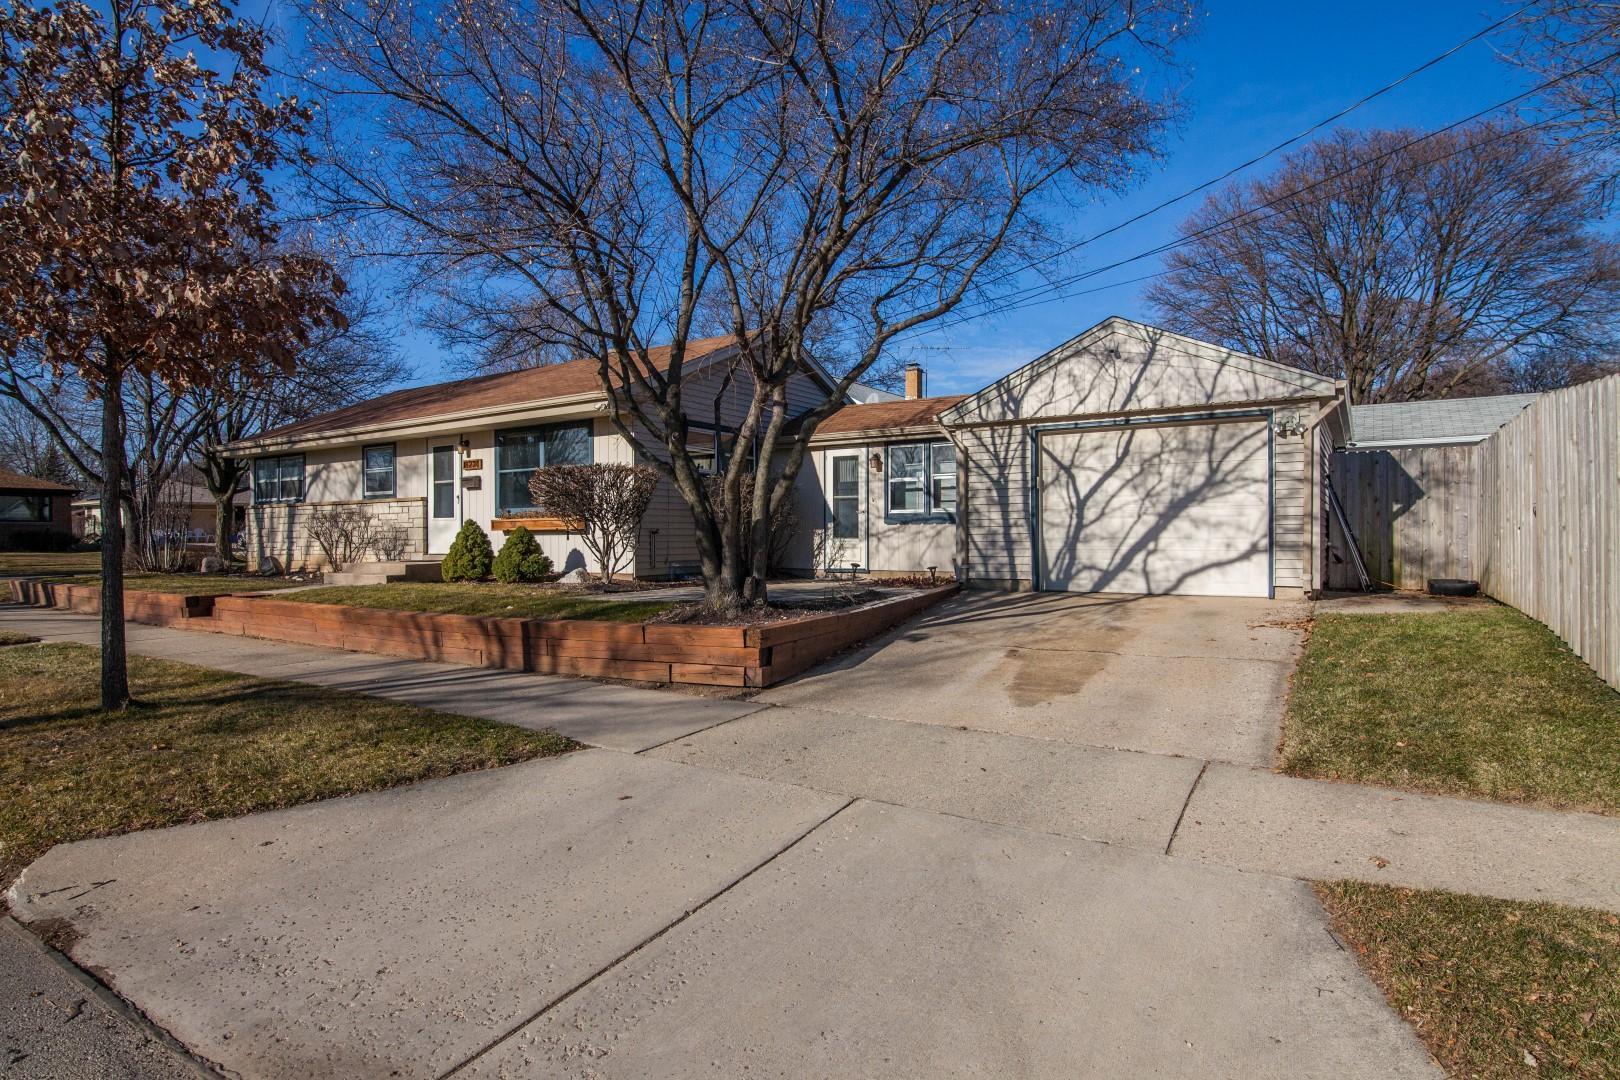 8230 Nash St, Milwaukee, Wisconsin 53222, 3 Bedrooms Bedrooms, ,1 BathroomBathrooms,Single-family,For Sale,Nash St,1721324